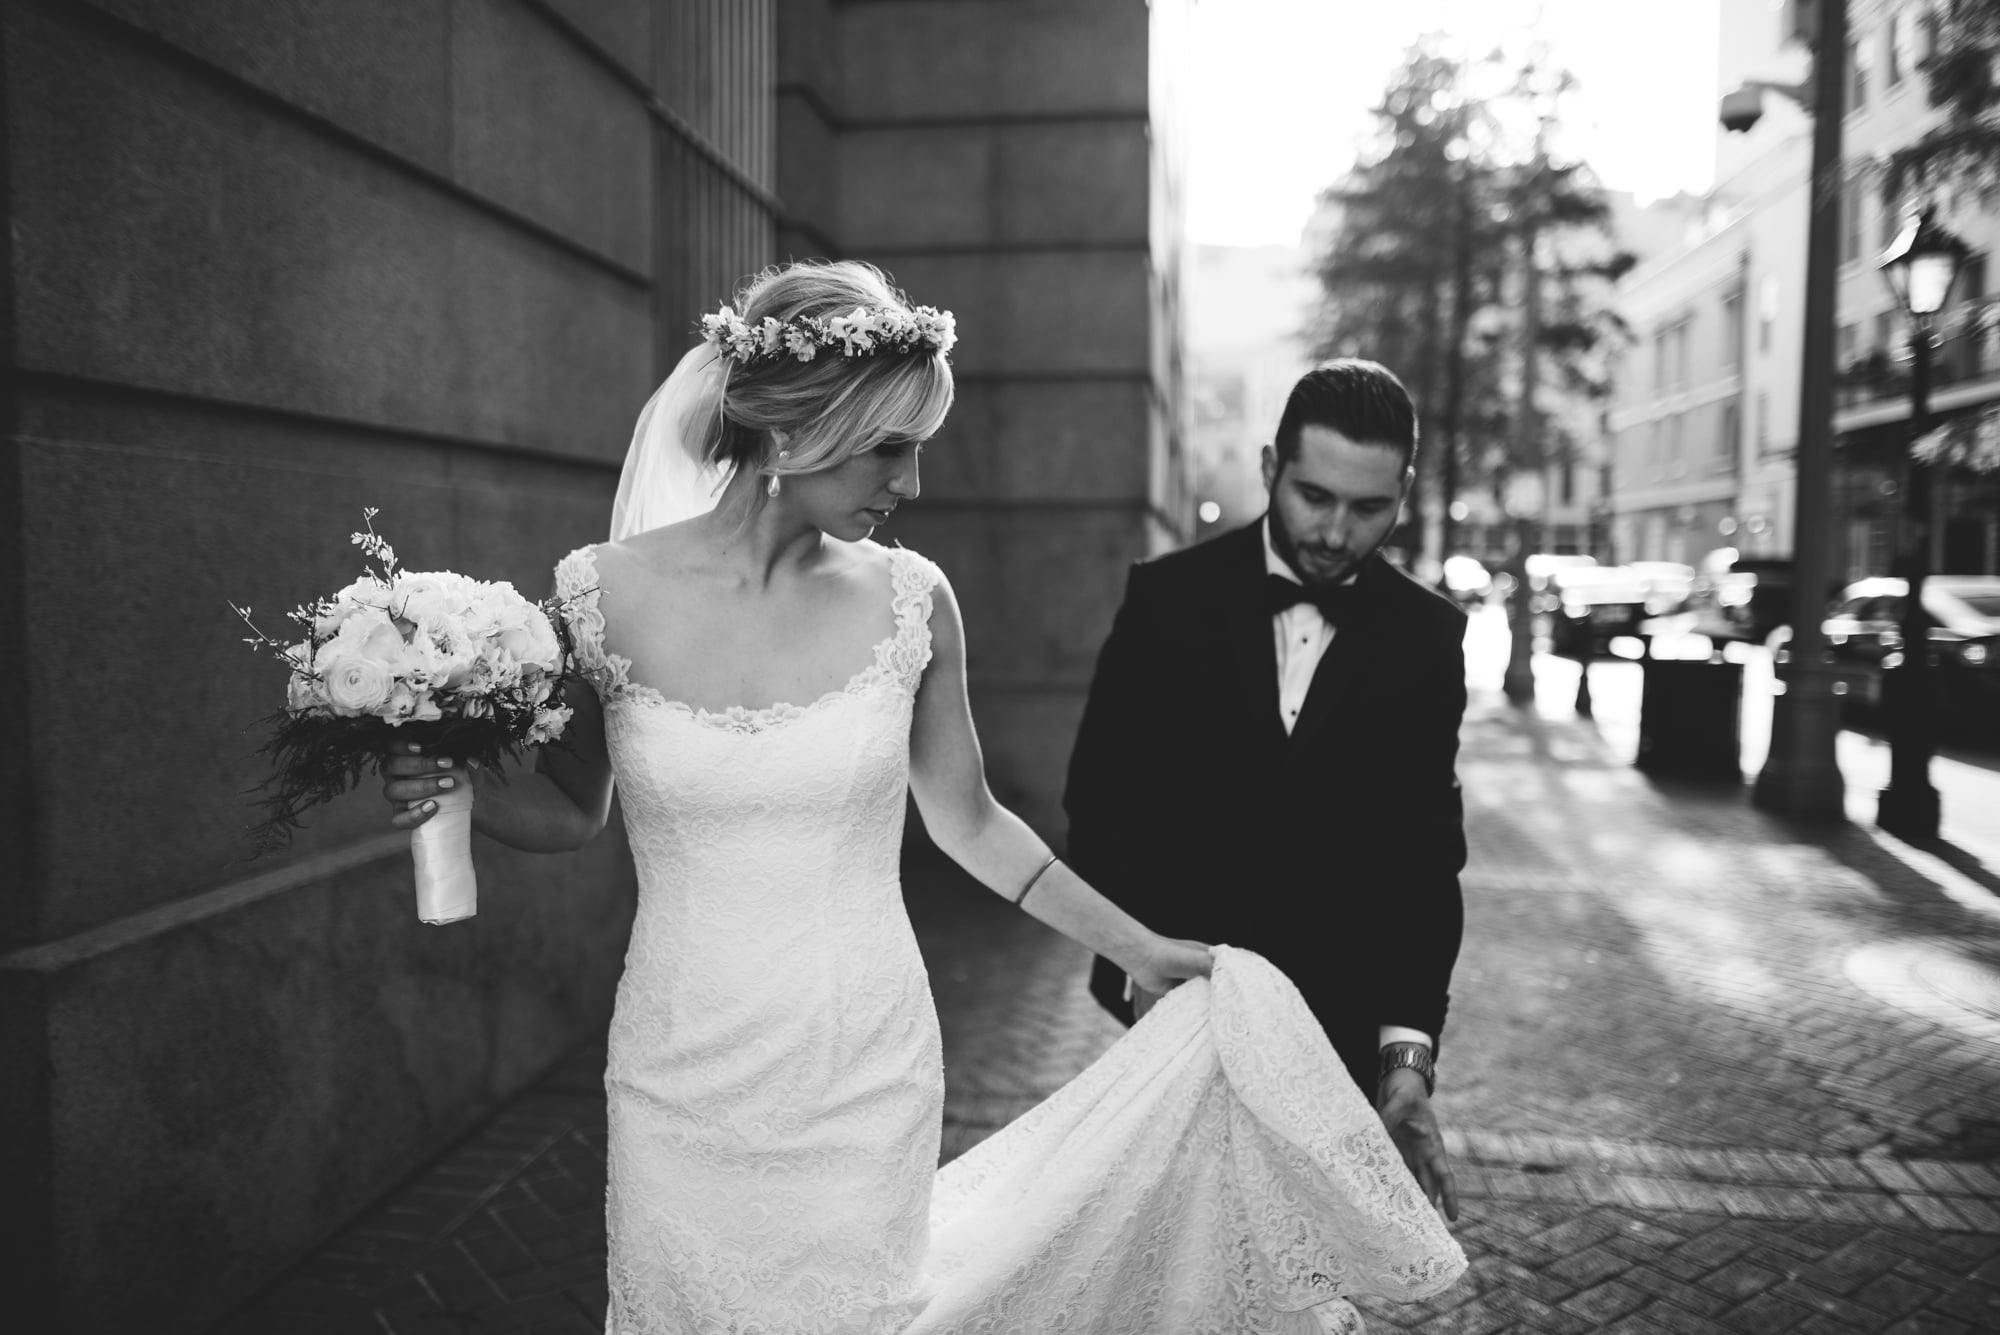 ©Isaiah & Taylor Photography - The Elms Mansion Wedding - New Orleans, Louisiana-33.jpg